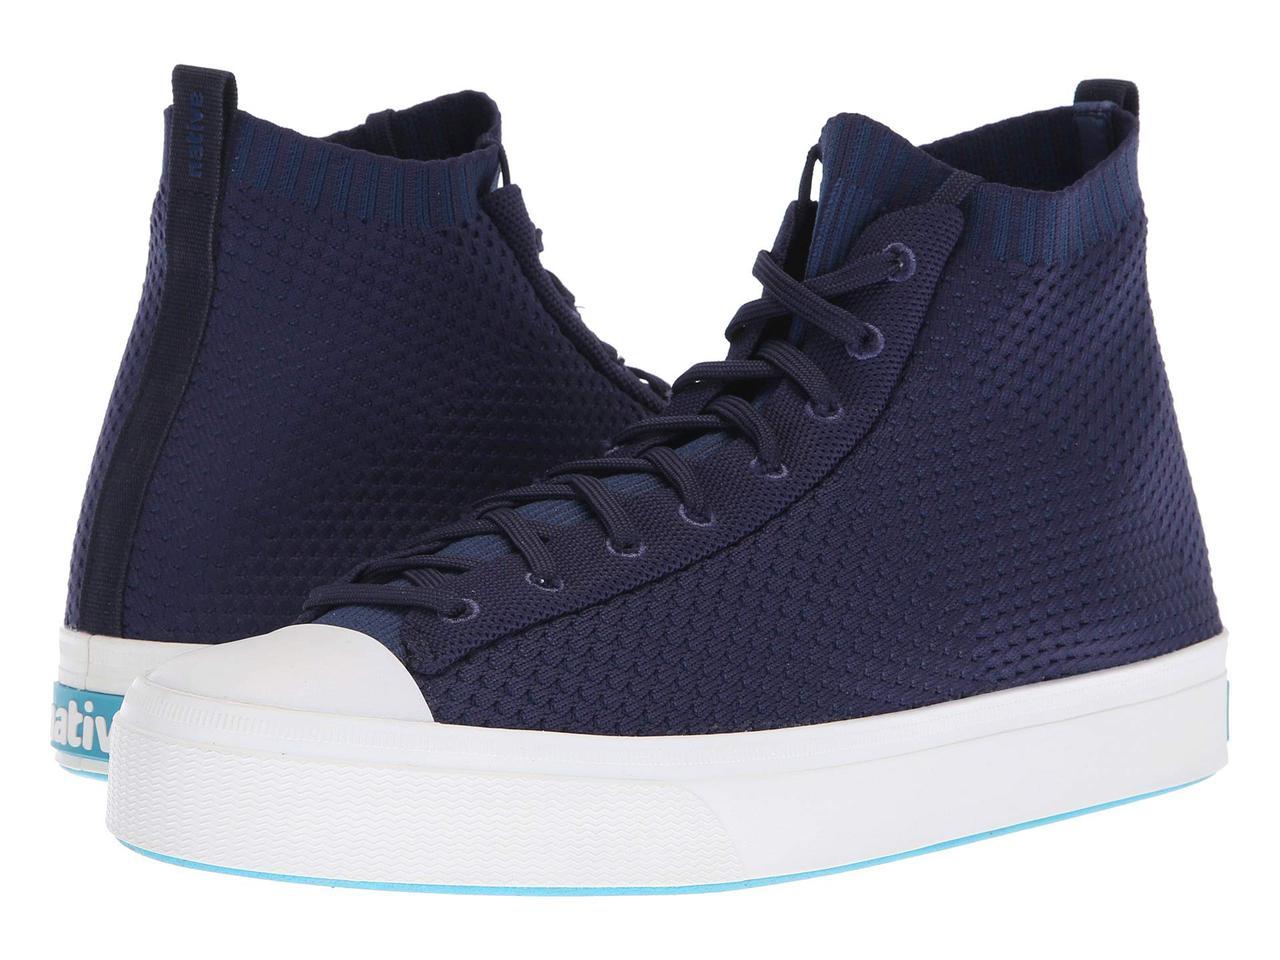 8df87ba94677 Кроссовки Кеды (Оригинал) Native Shoes Jefferson 2.0 High Regatta Blue Shell  White